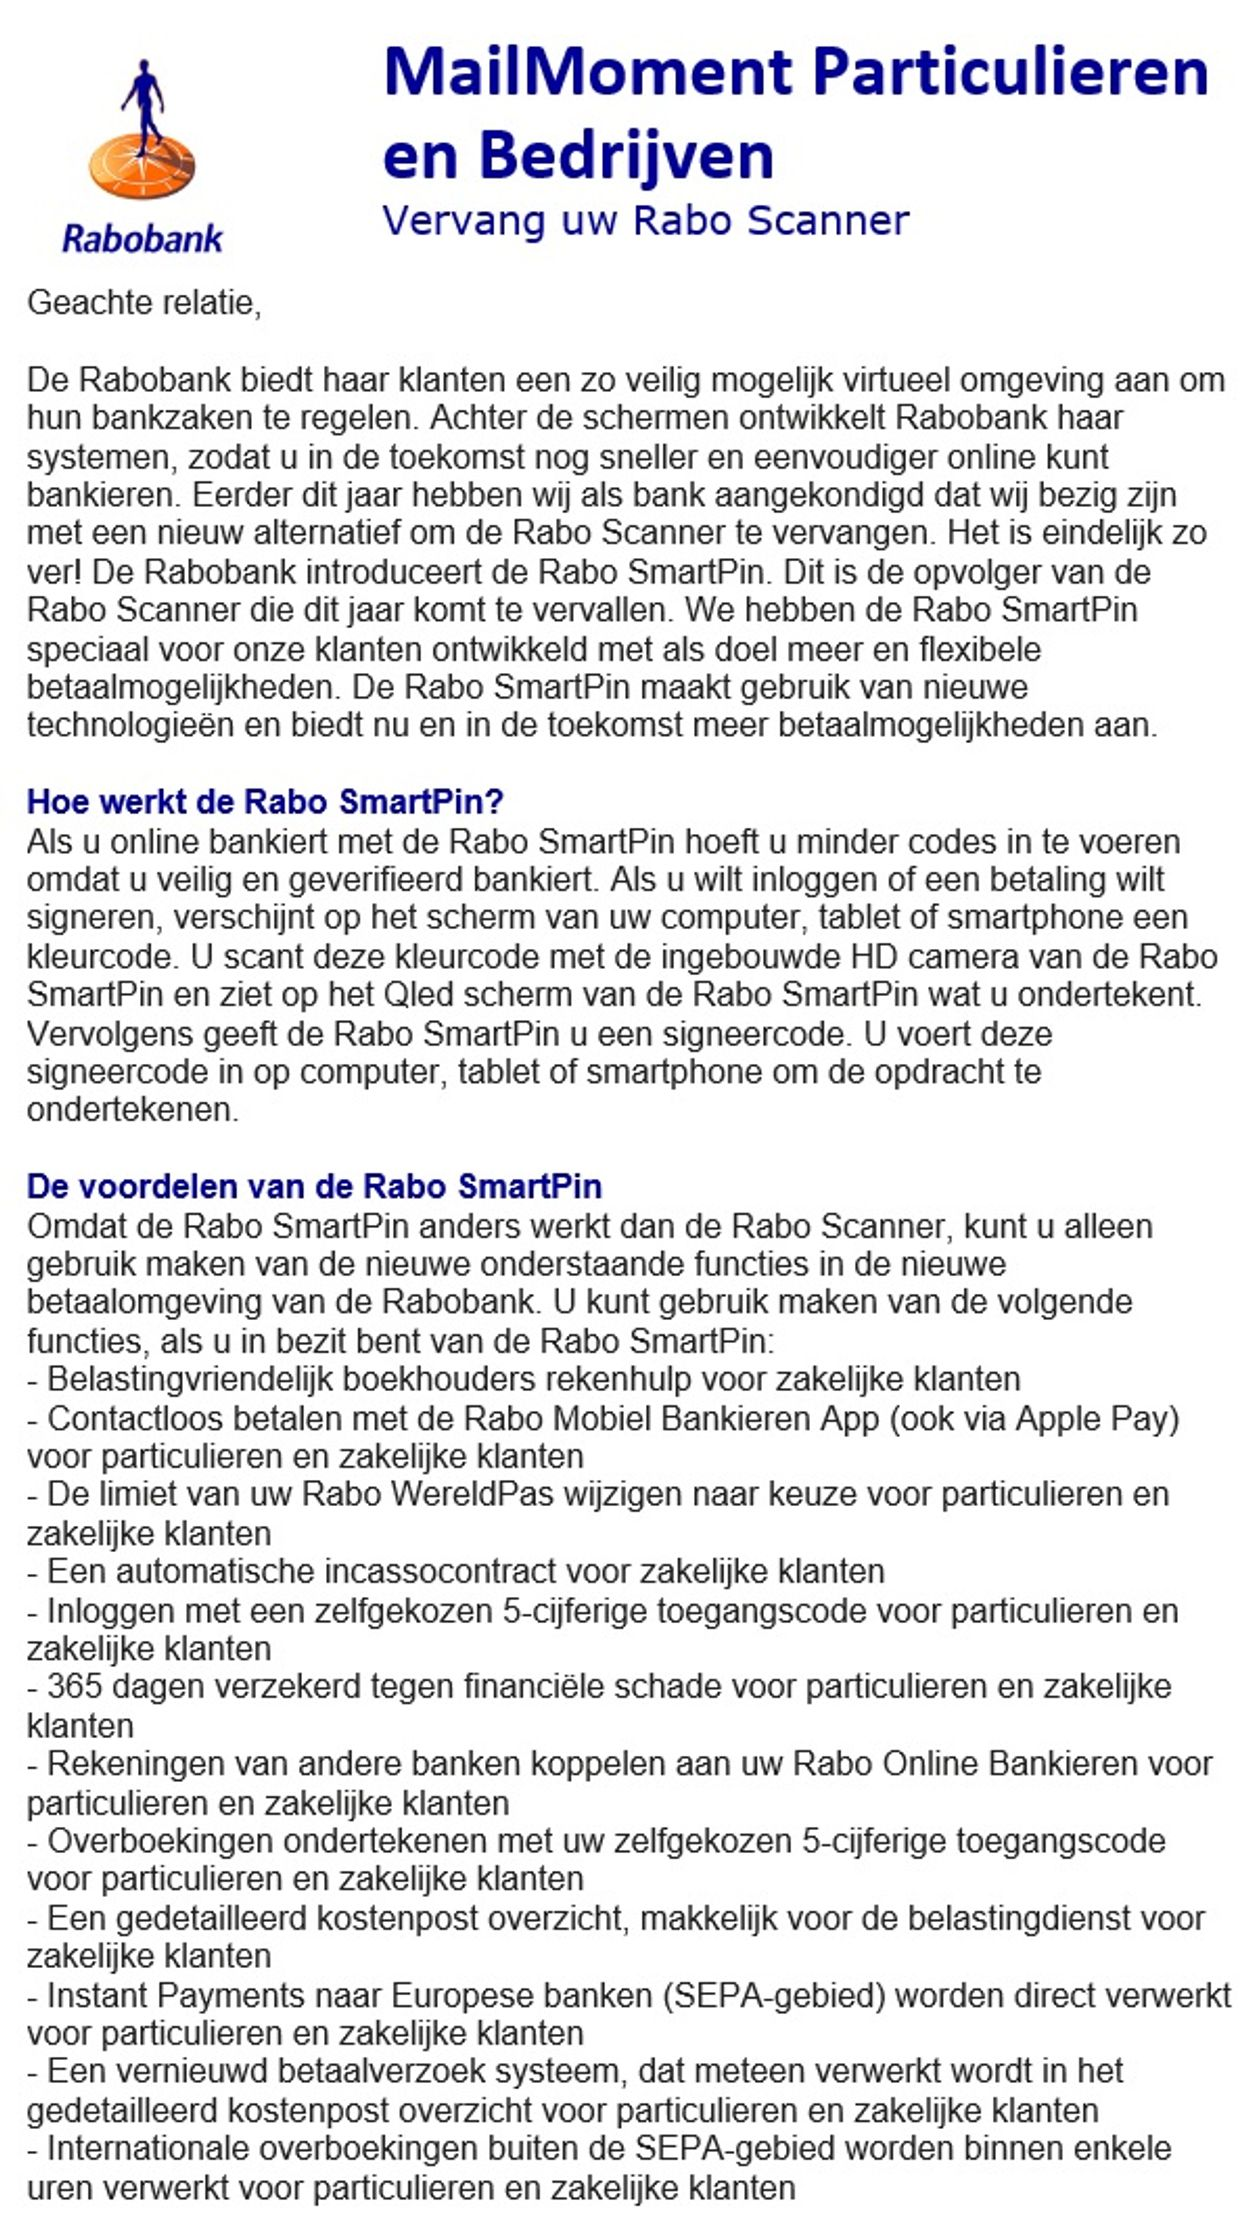 Rabo Phishing (1 van 2)